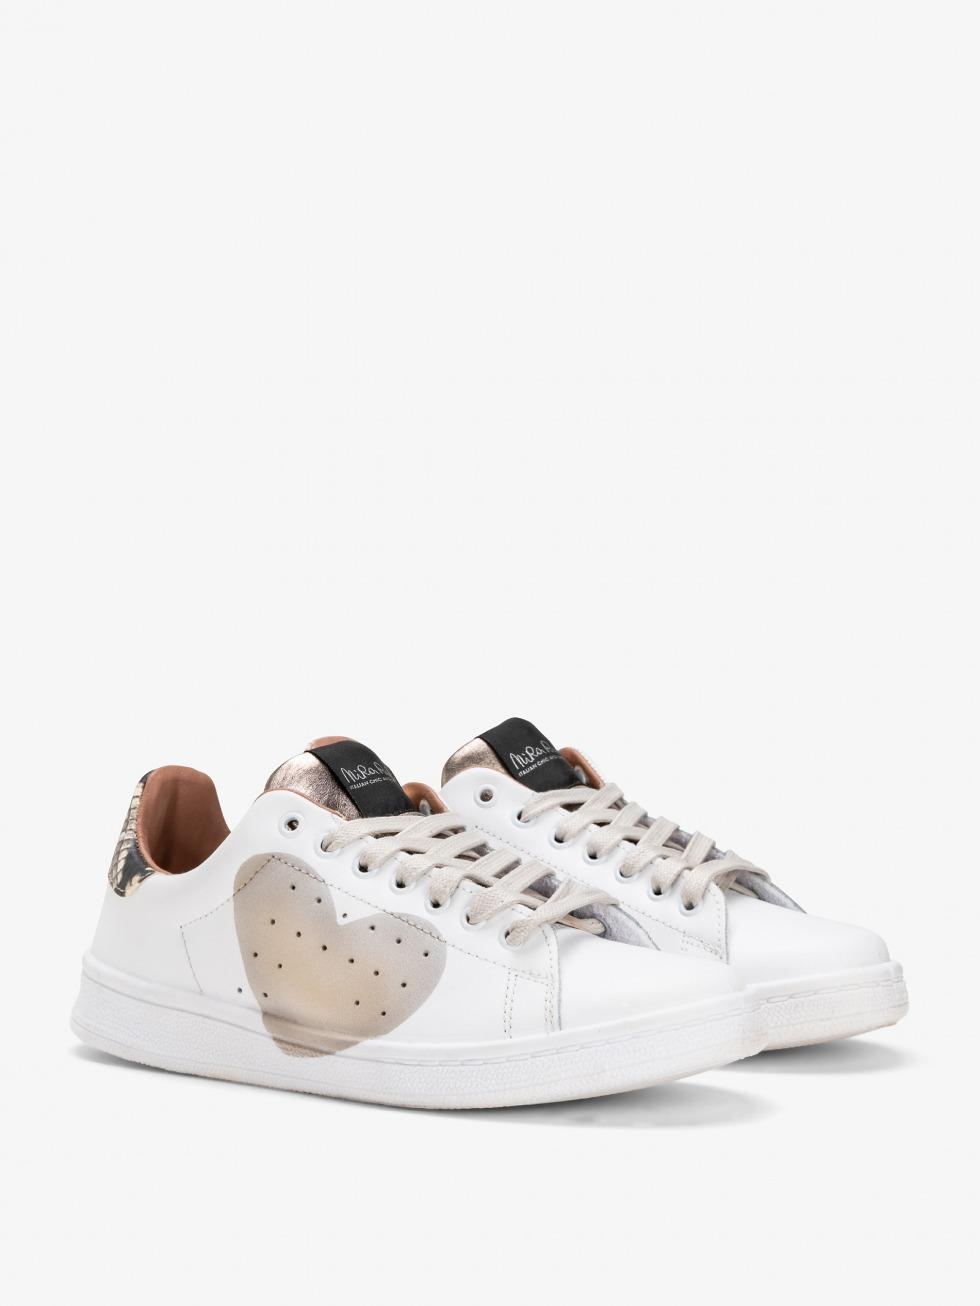 Daiquiri Python Sneakers - Heart